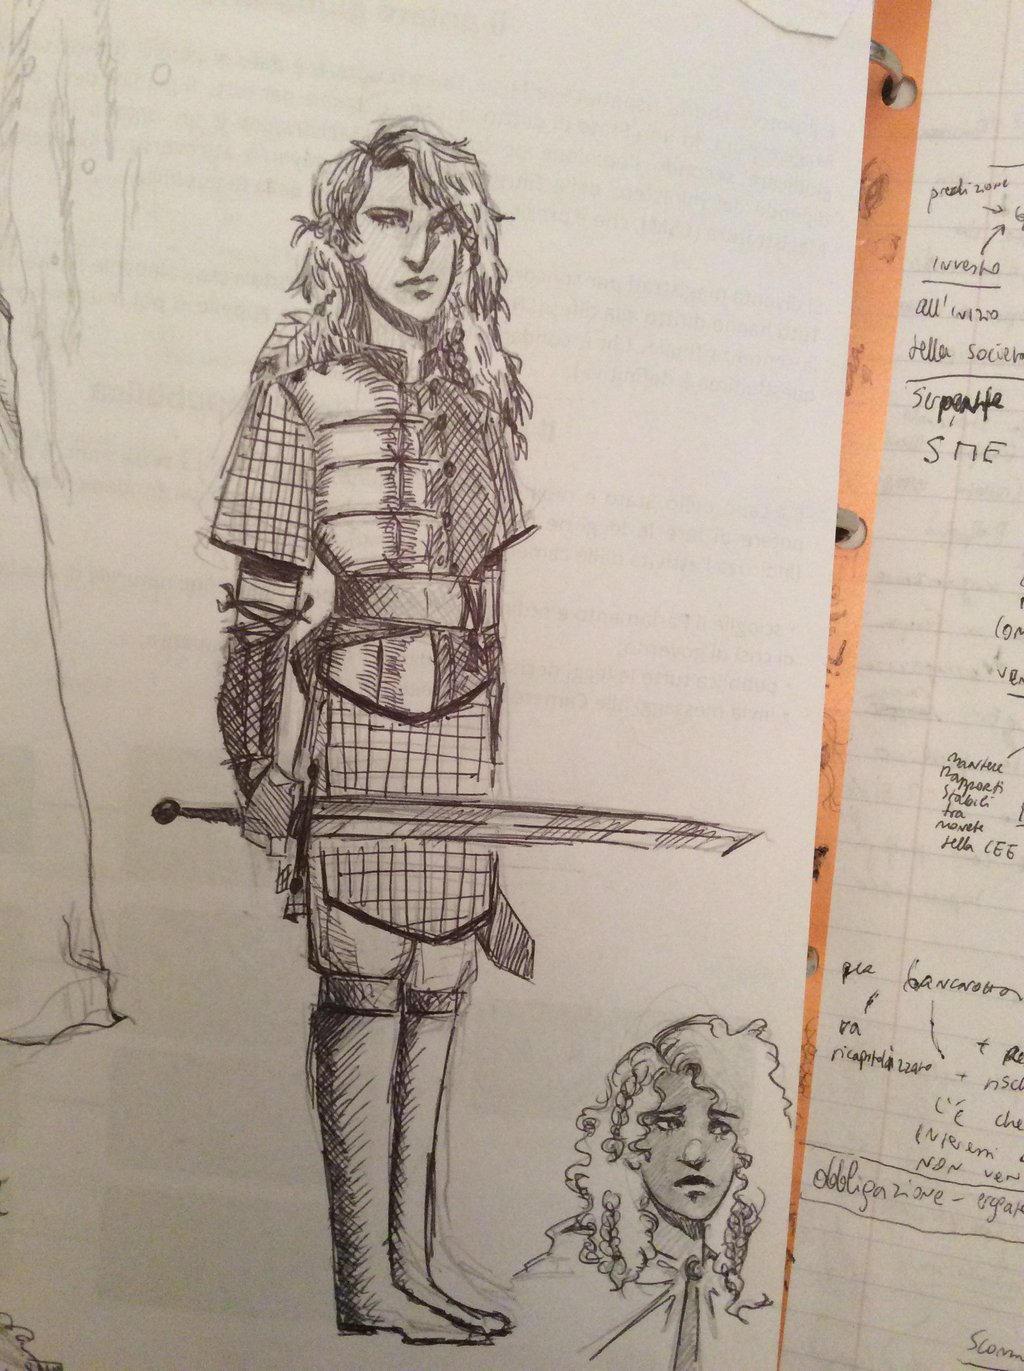 Percy Jackson by leduemedaglie on DeviantArt